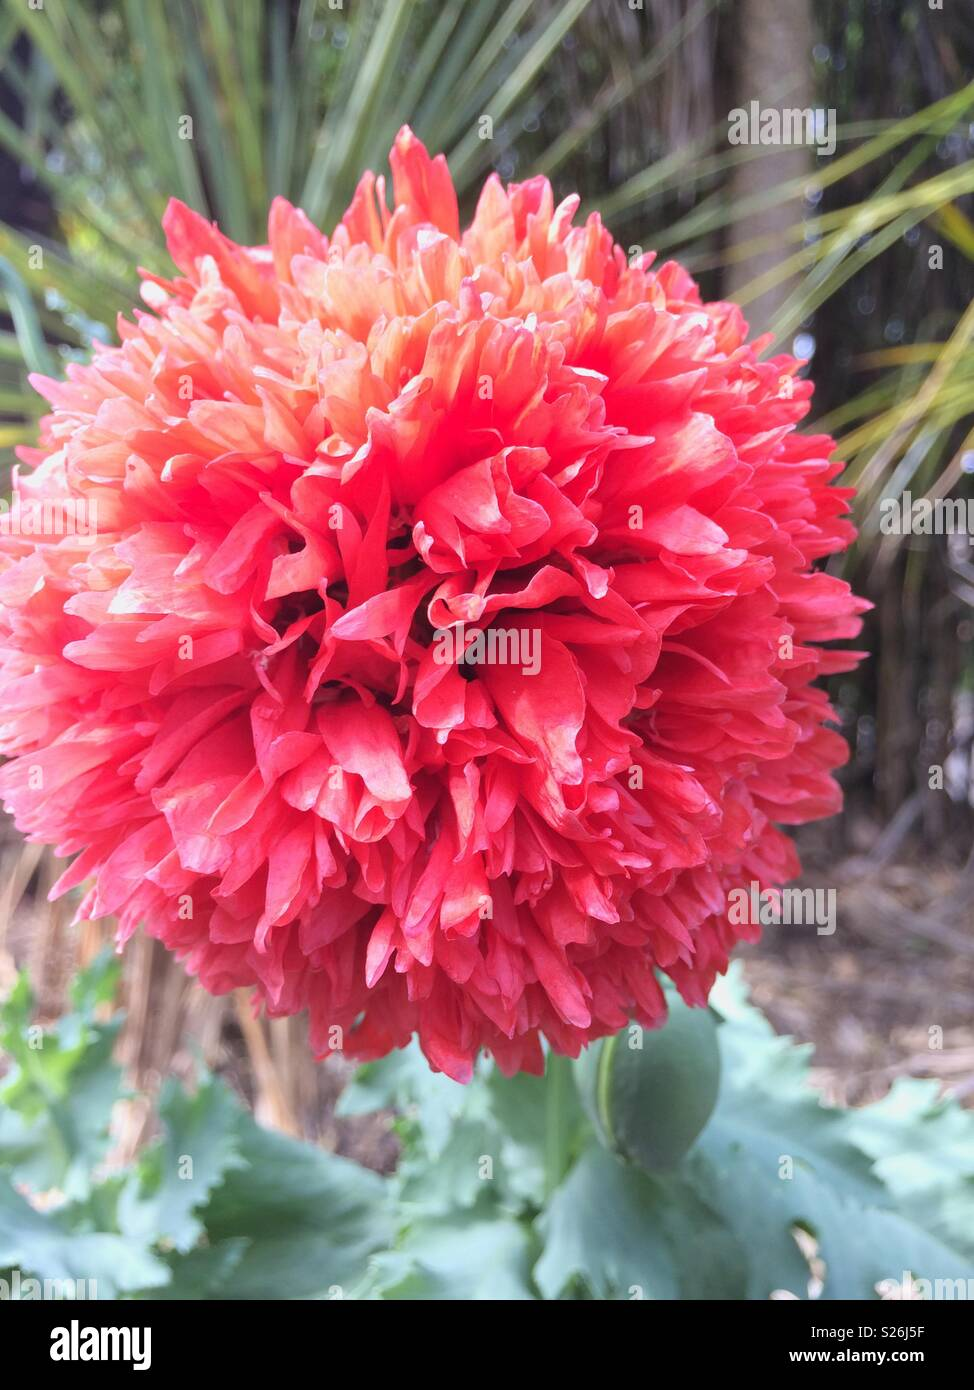 Lust Auf Lachs Pink Poppy Flower Stockfoto Bild 311161915 Alamy